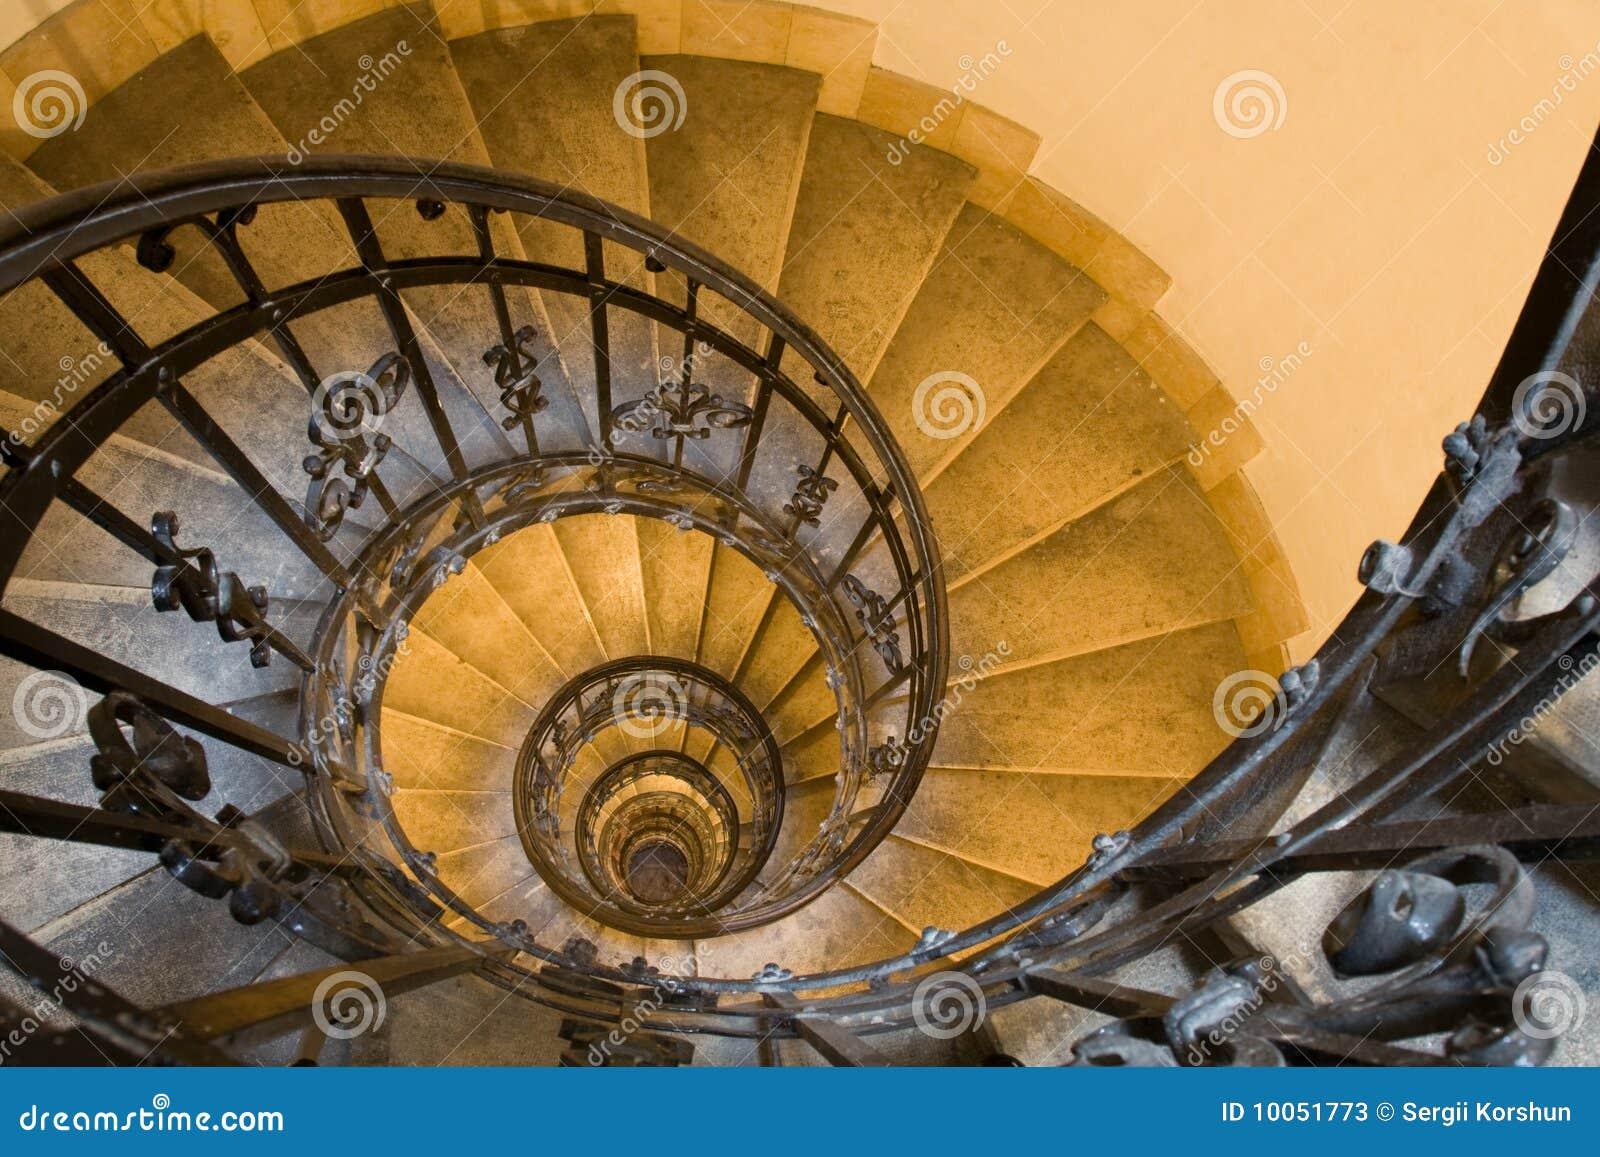 Escadaria espiral e etapas de pedra na torre velha